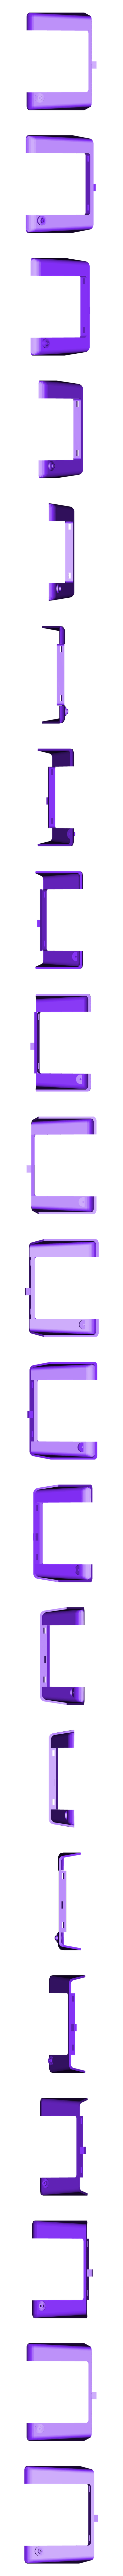 techoatras1.stl Download STL file HUMMER H1 - Assembly model kit 1:35 • 3D print model, guillesilvestrini